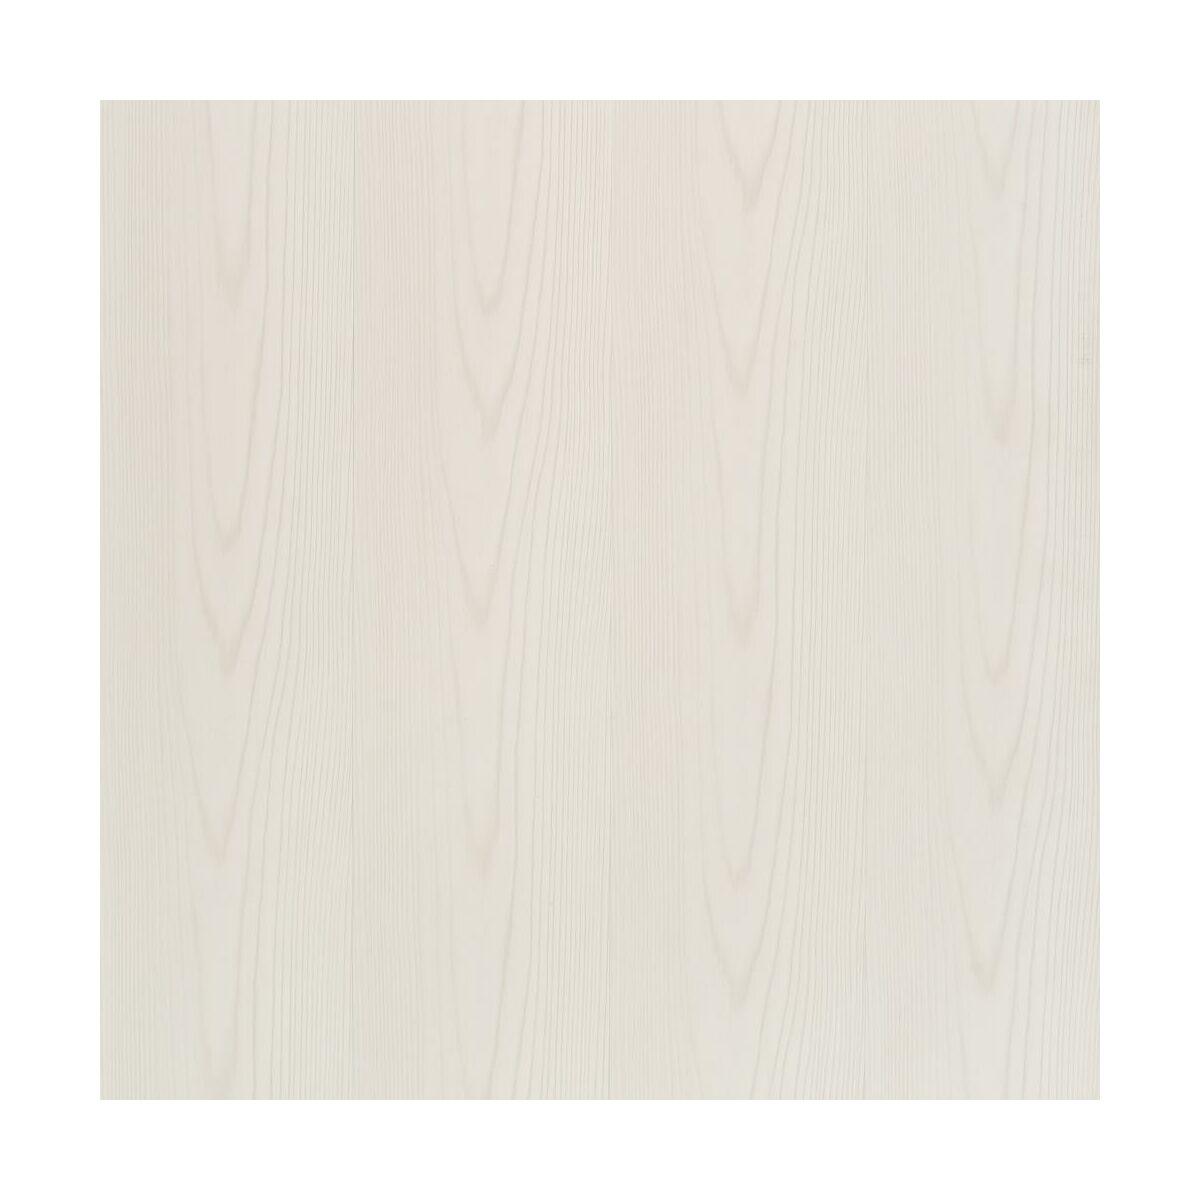 Panel ścienny Vilo Motivo Light Brown Wood Vox